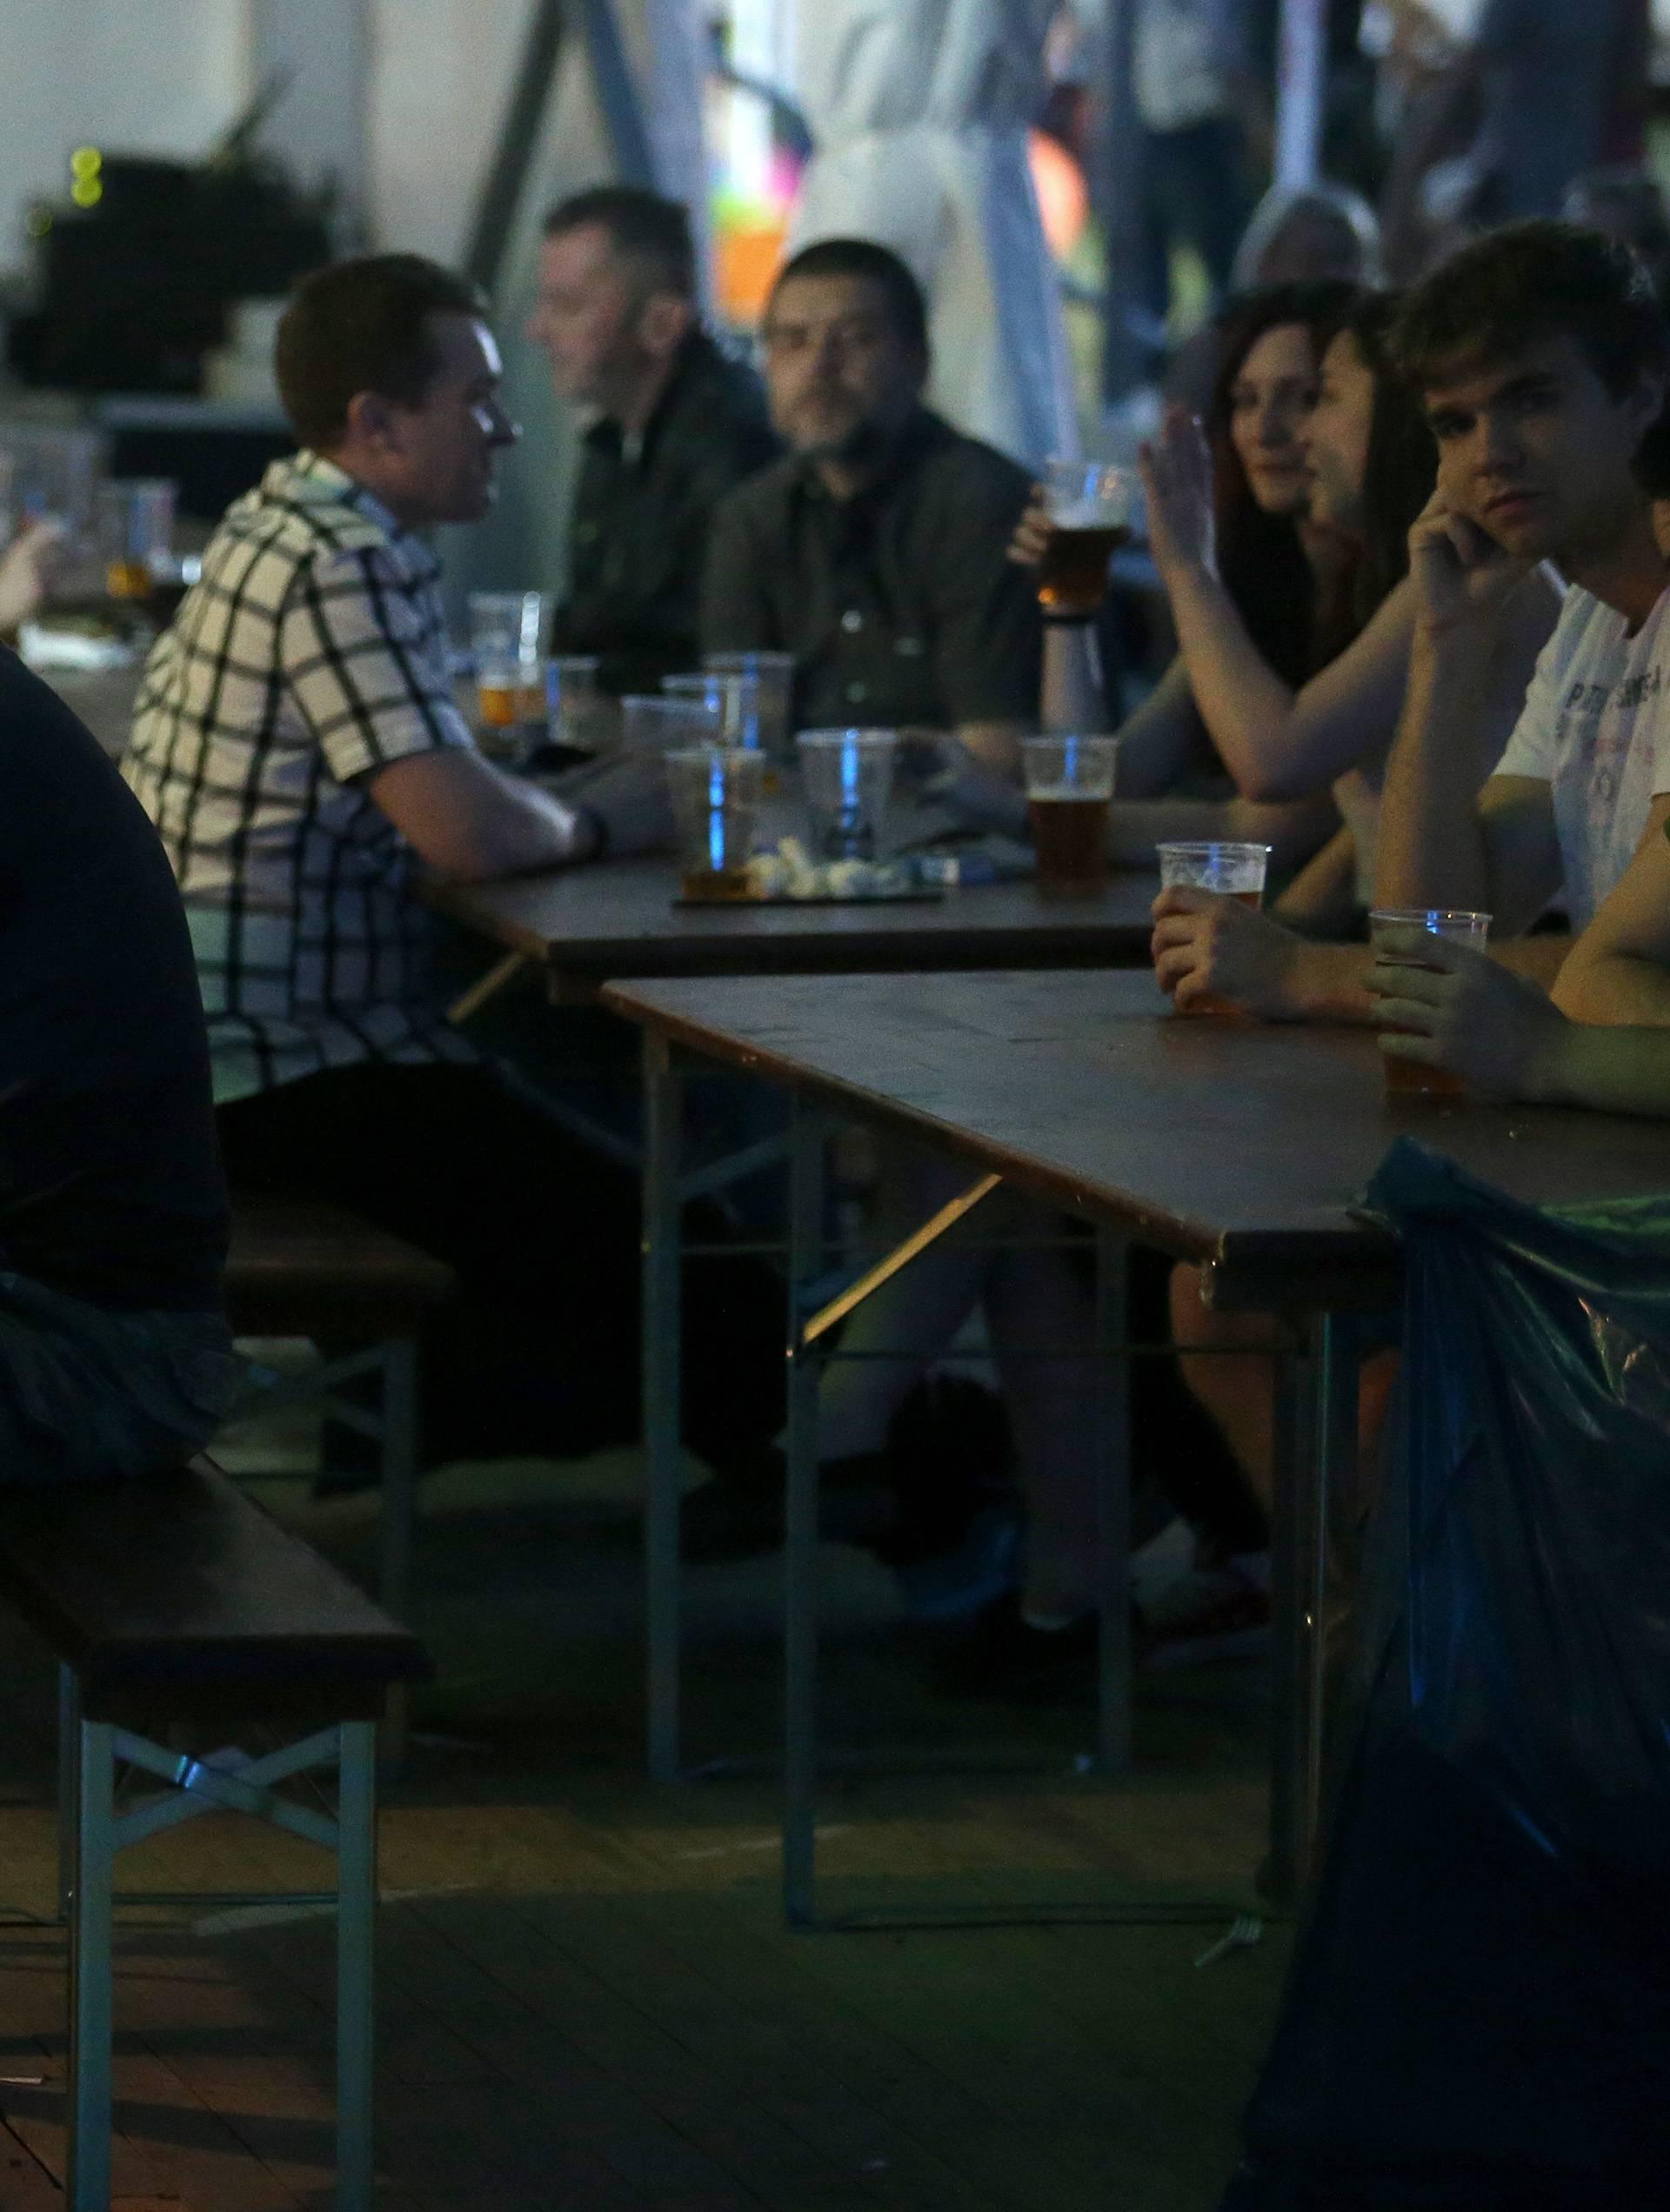 Tulum se nastavlja:  Mangroove rasplesali ekipu na Chill&Grillu